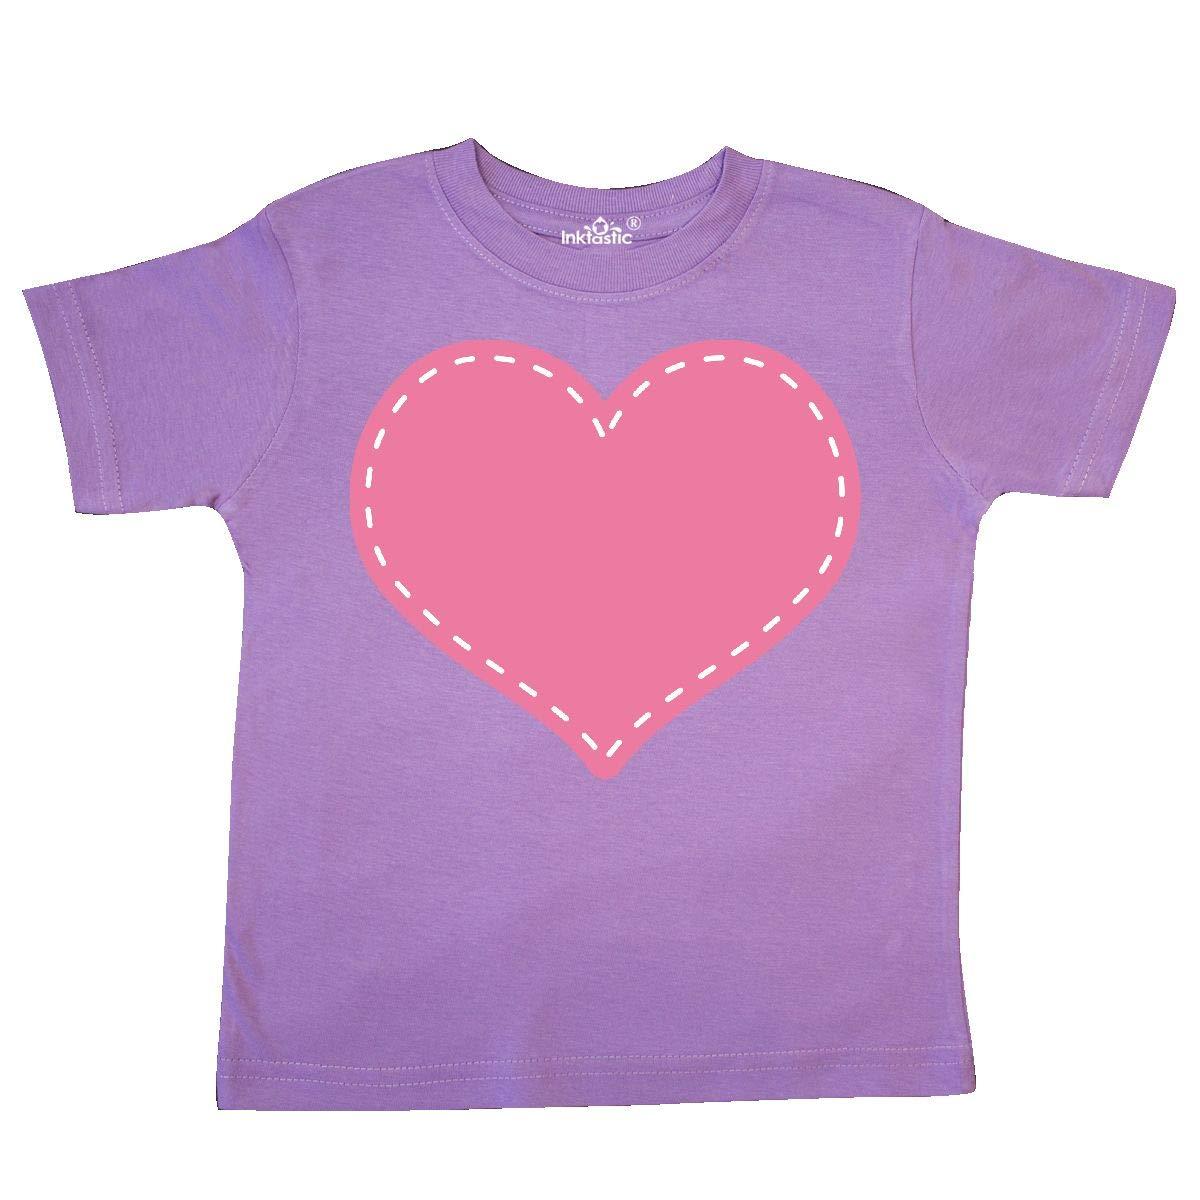 Toddler T-Shirt inktastic Pink Heart Stitch Border